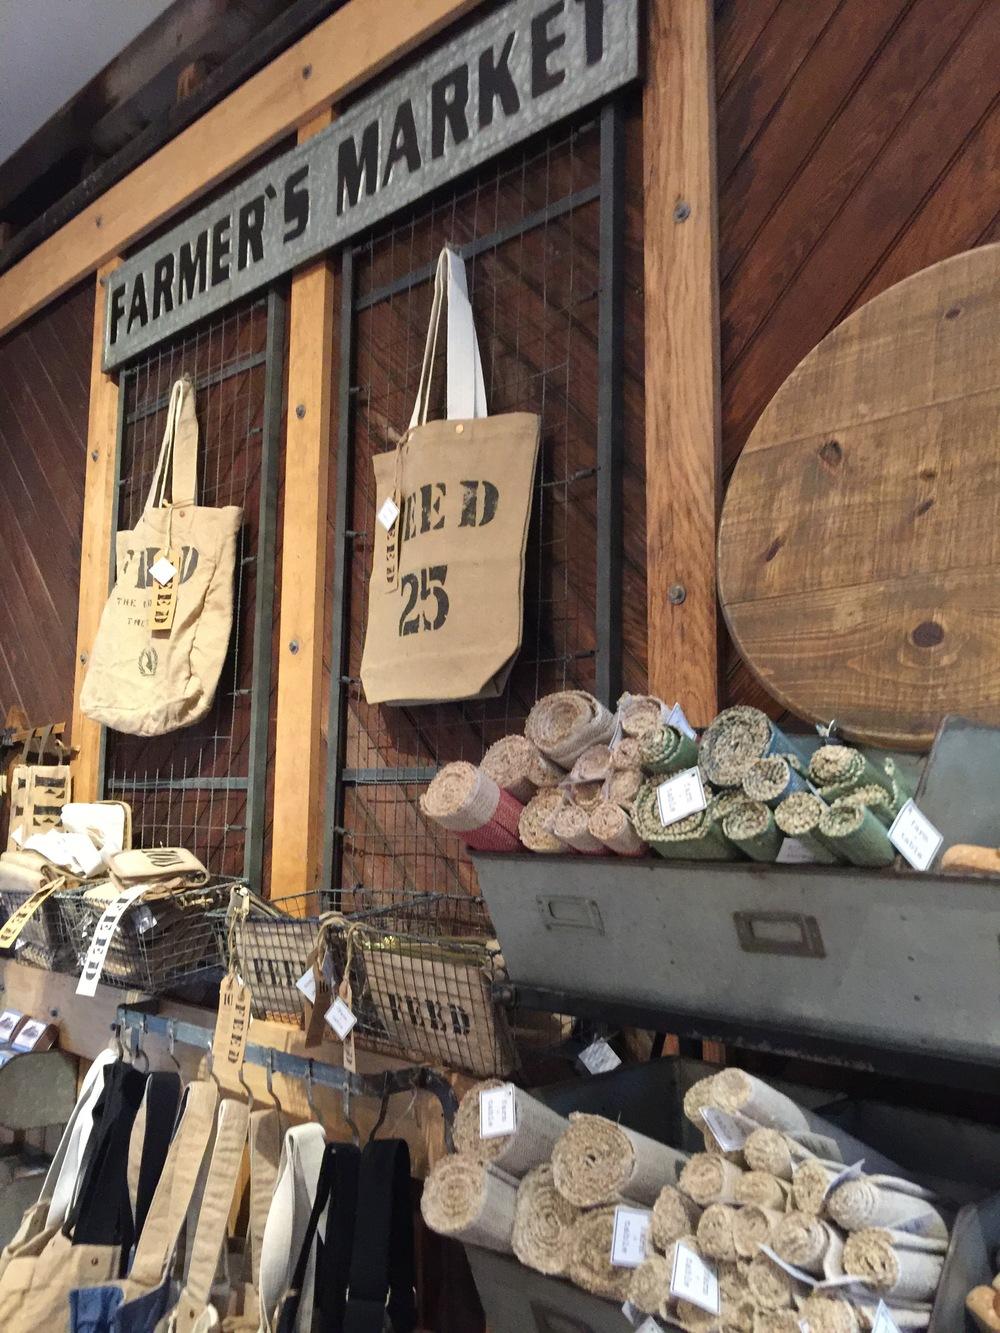 farm+table-farm-table-kennebunkport-kennebunk-maine-best-shopping-seacoast-lately-blog.jpg8.jpg